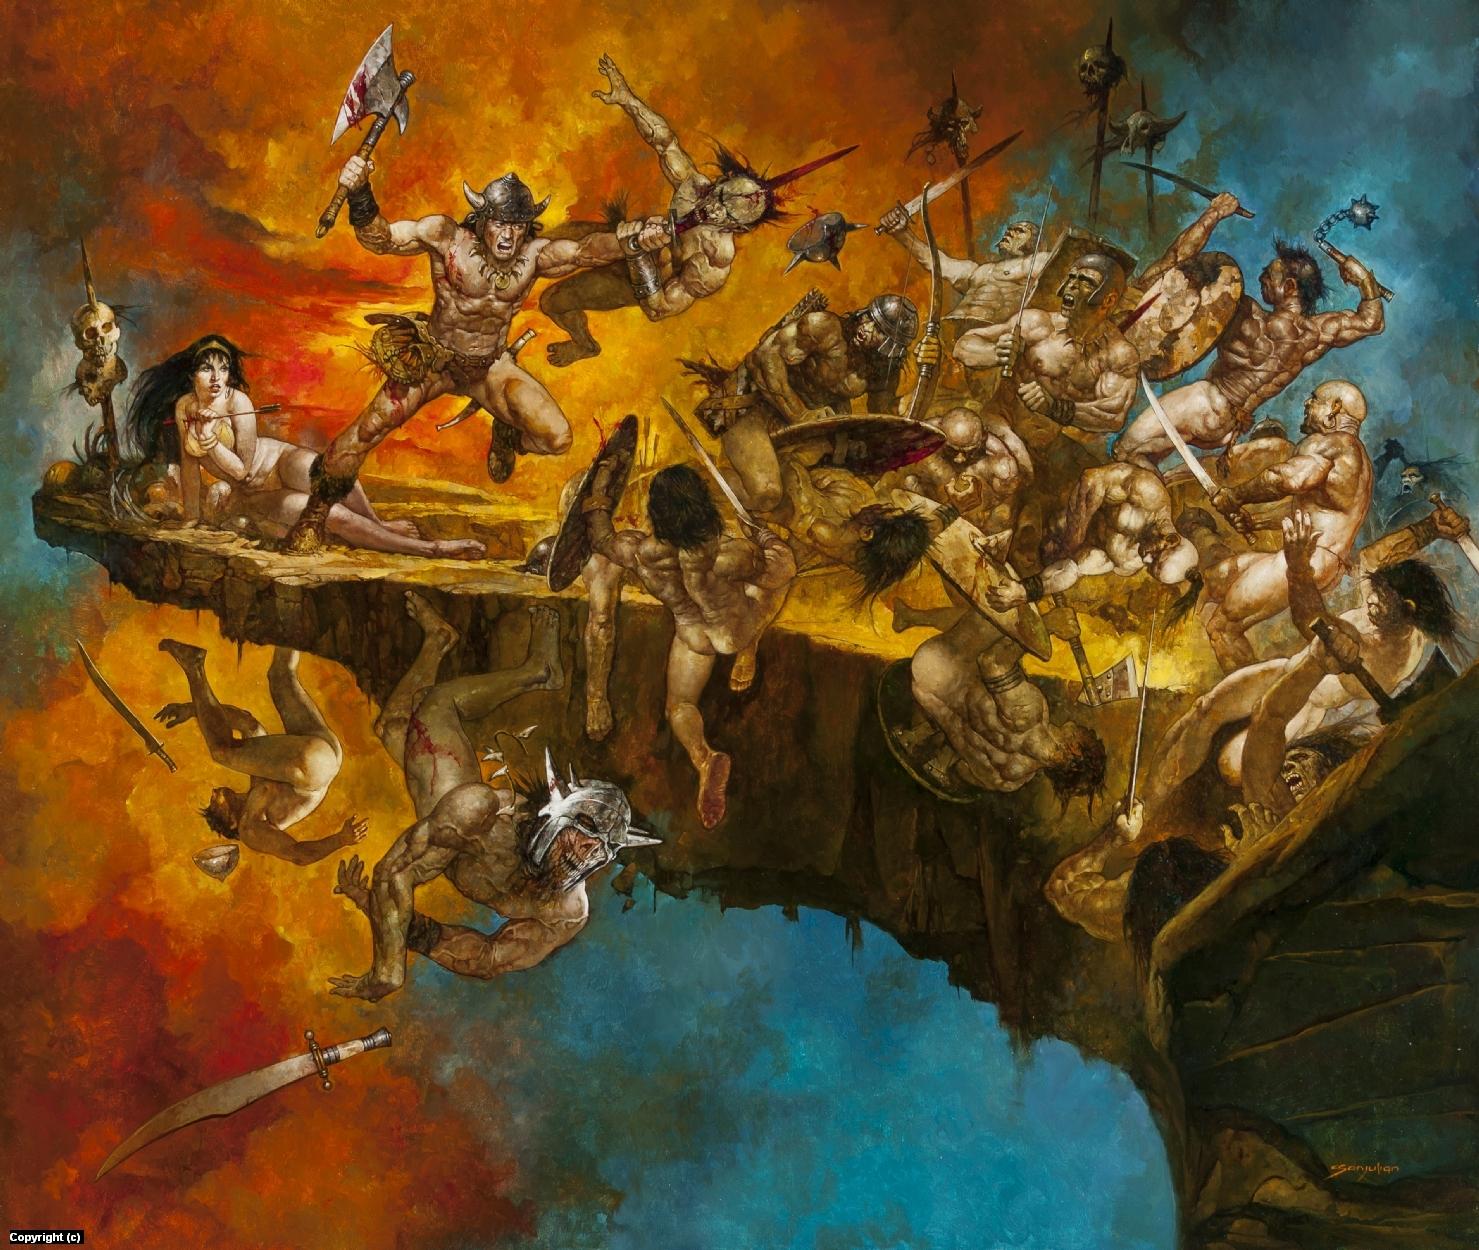 No Where to Run Conan vs. The Horde Artwork by Manuel Sanjulian